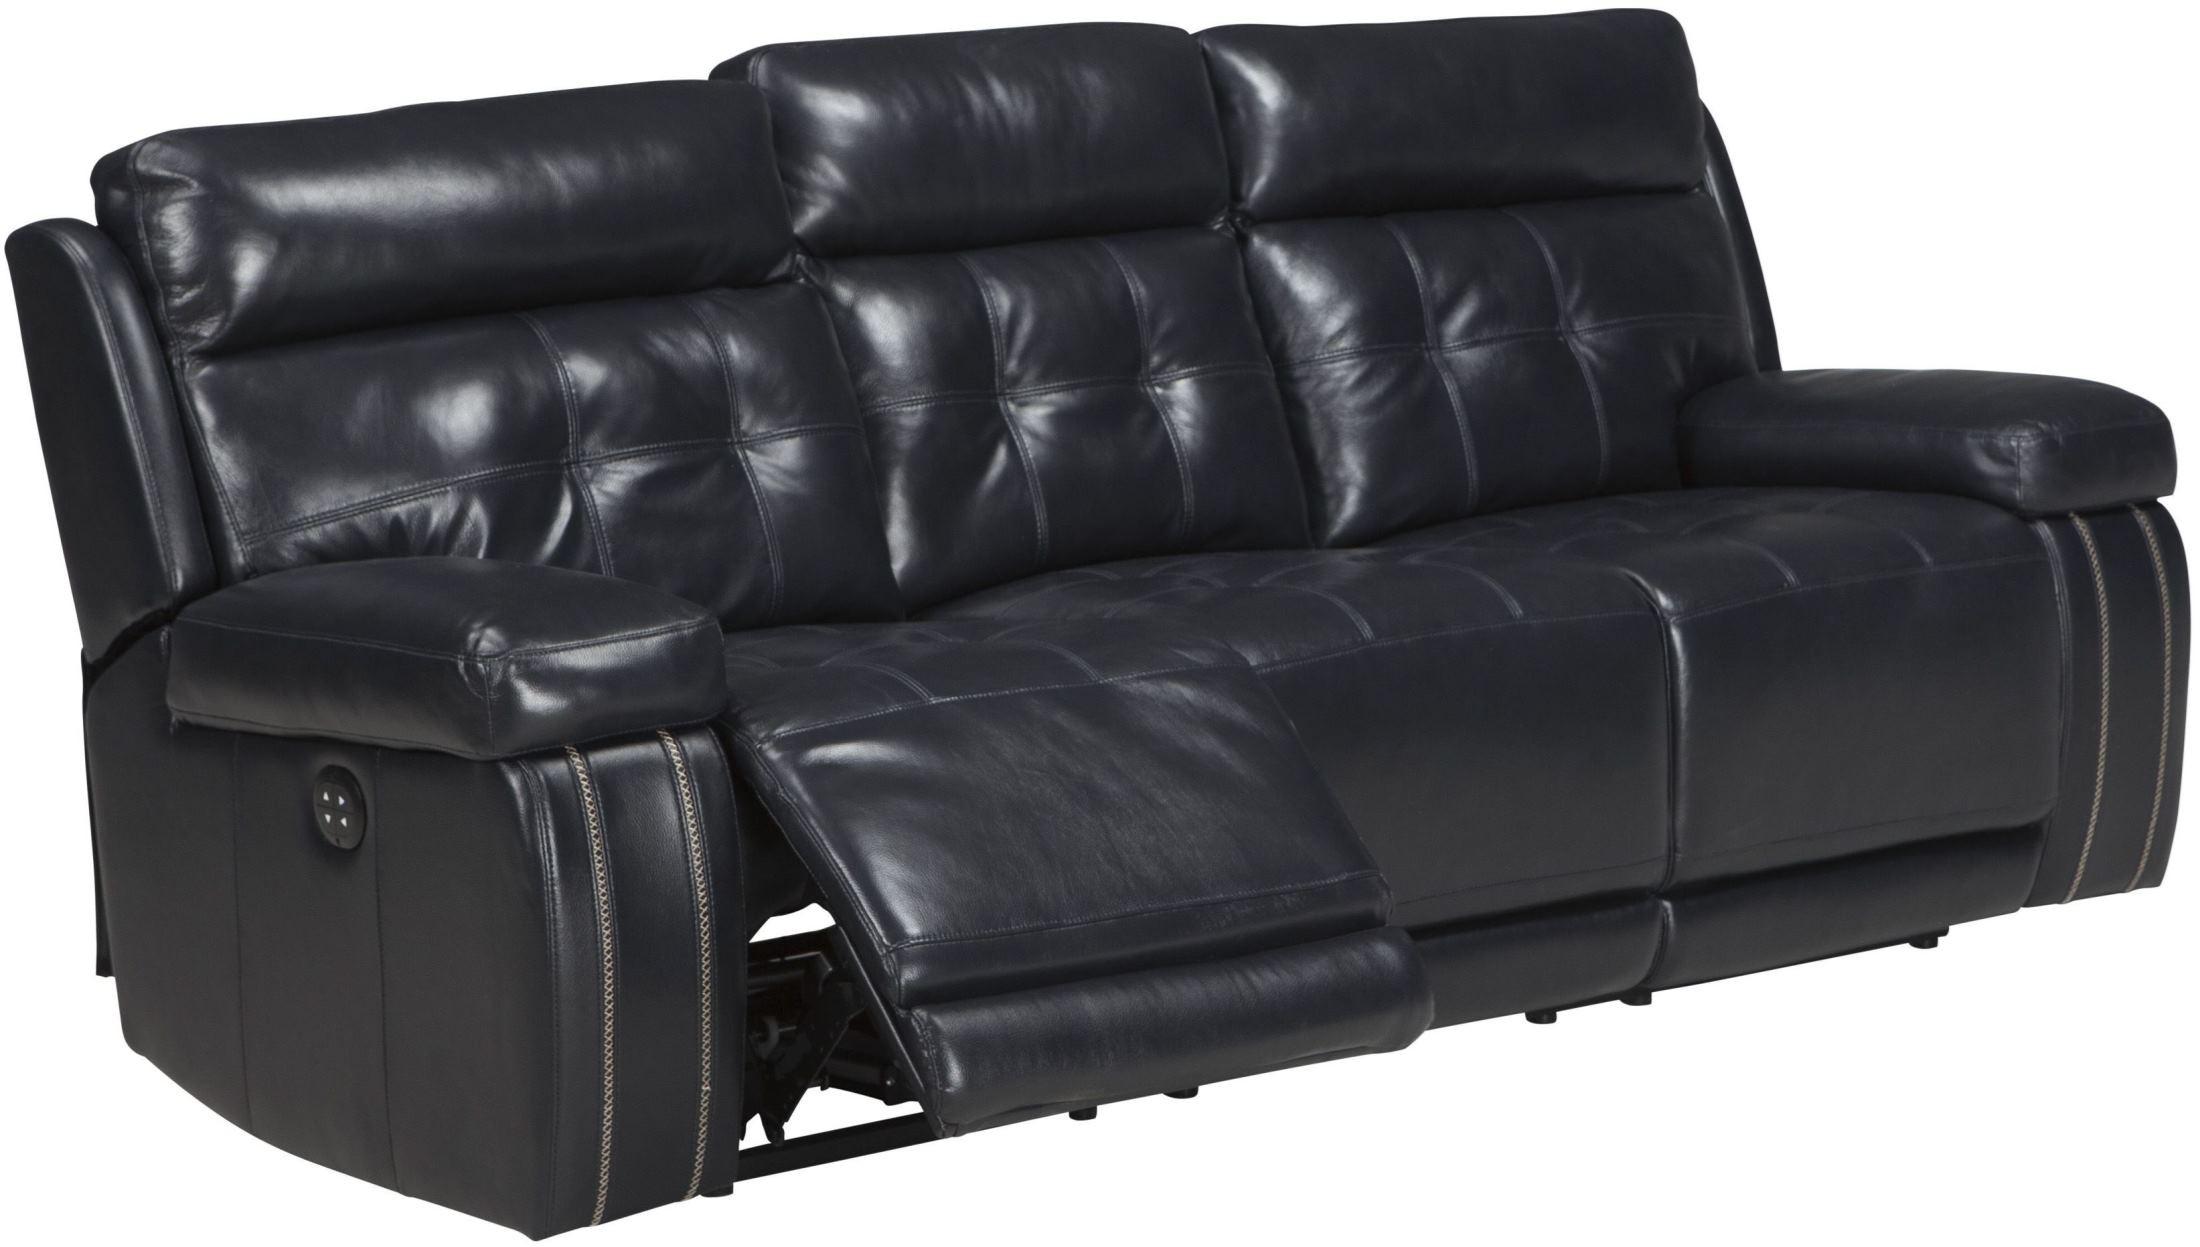 Graford Navy Power Reclining Sofa With Adjustable Headrest